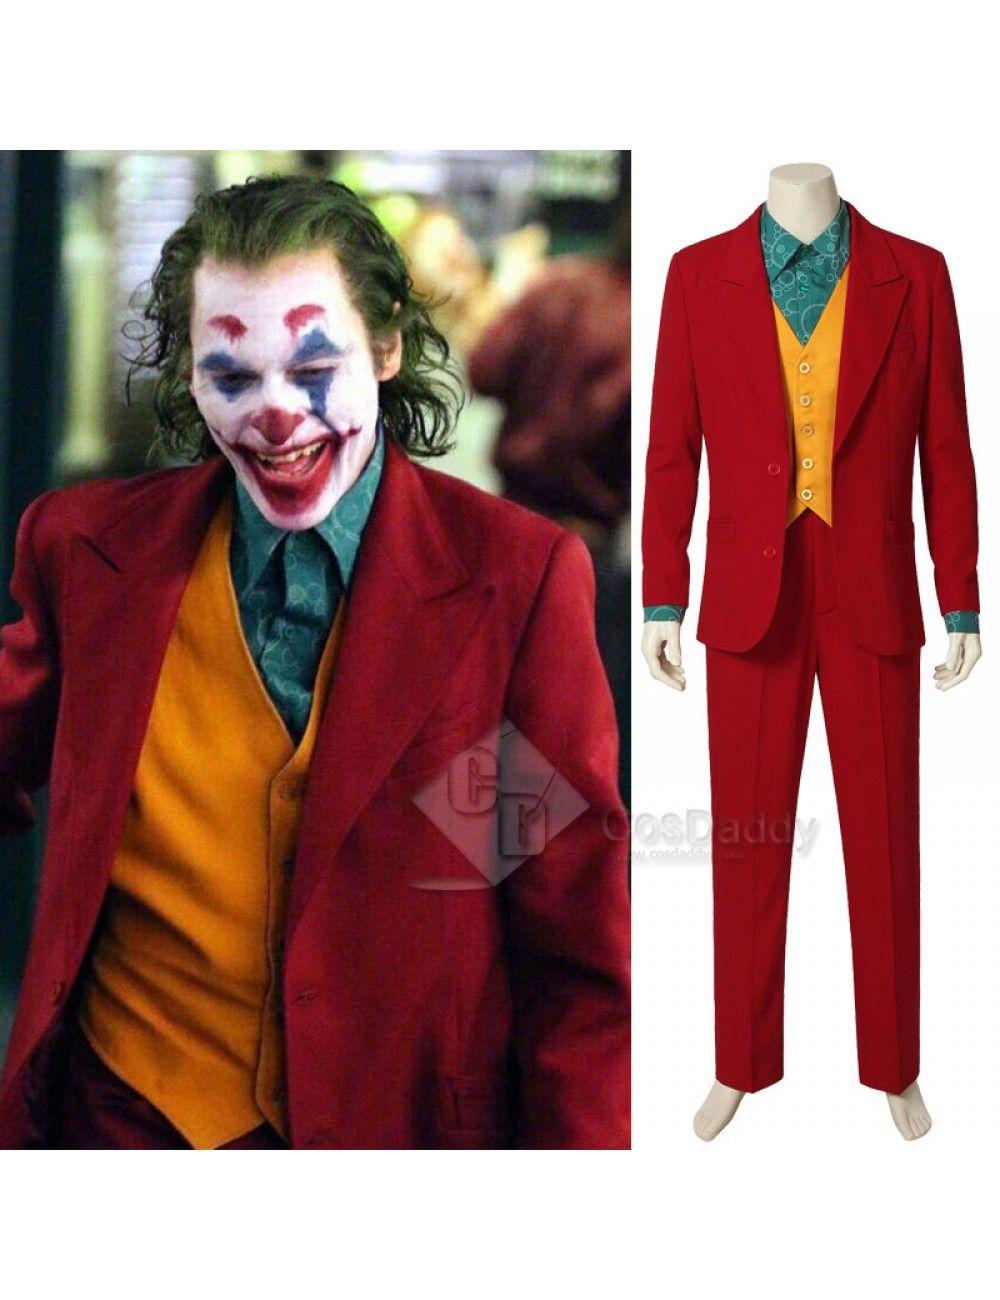 2019 Joker Joaquin Phoenix Arthur Fleck Uniform Cosplay